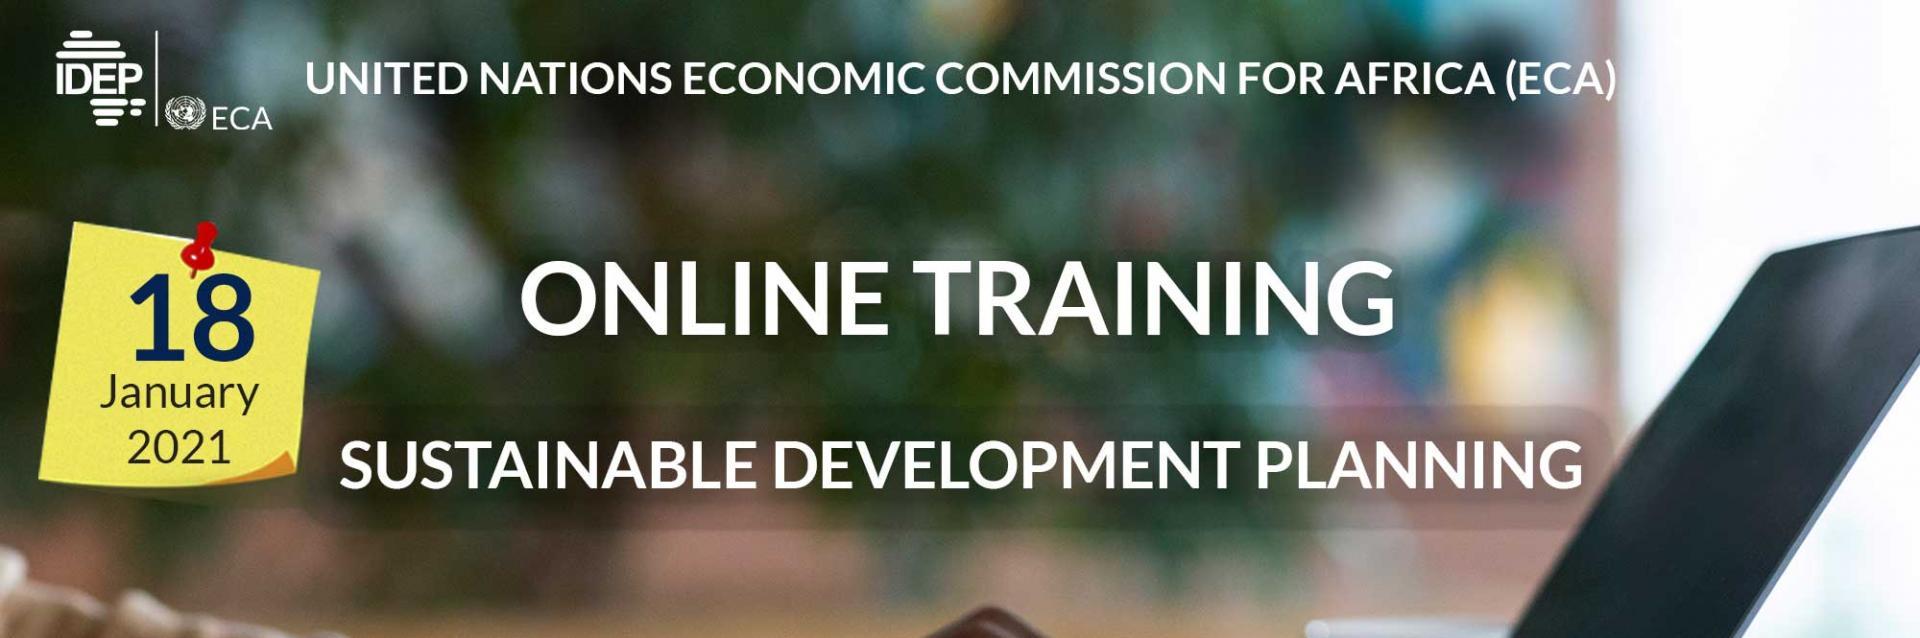 Sustainable Development Planning